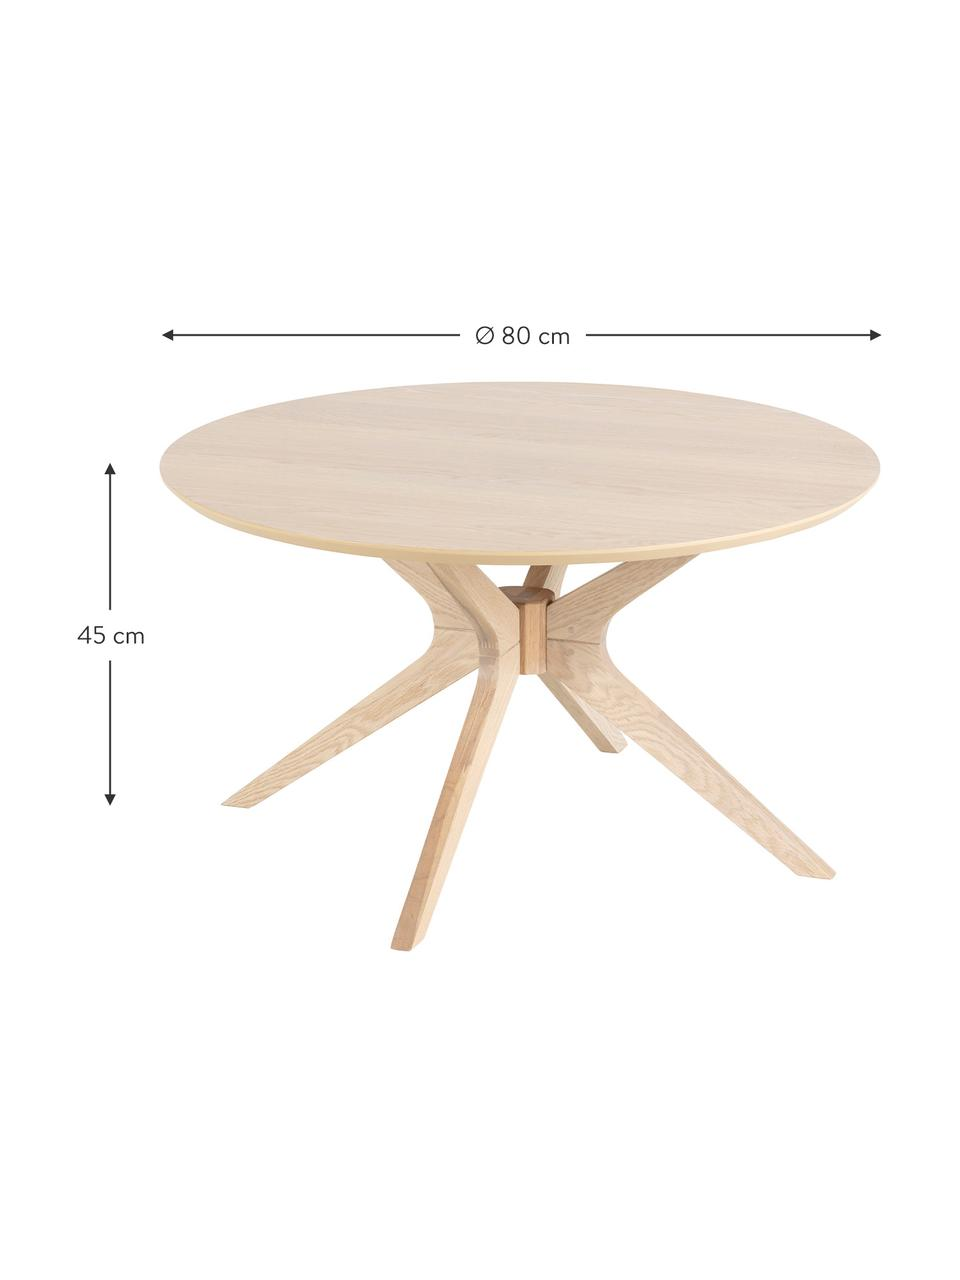 Ronde salontafel Duncan van eikenhout, Tafelblad: MDF, eikenhoutfineer, Poten: massief eikenhout, Eikenhoutkleurig, Ø 80 x H 45 cm